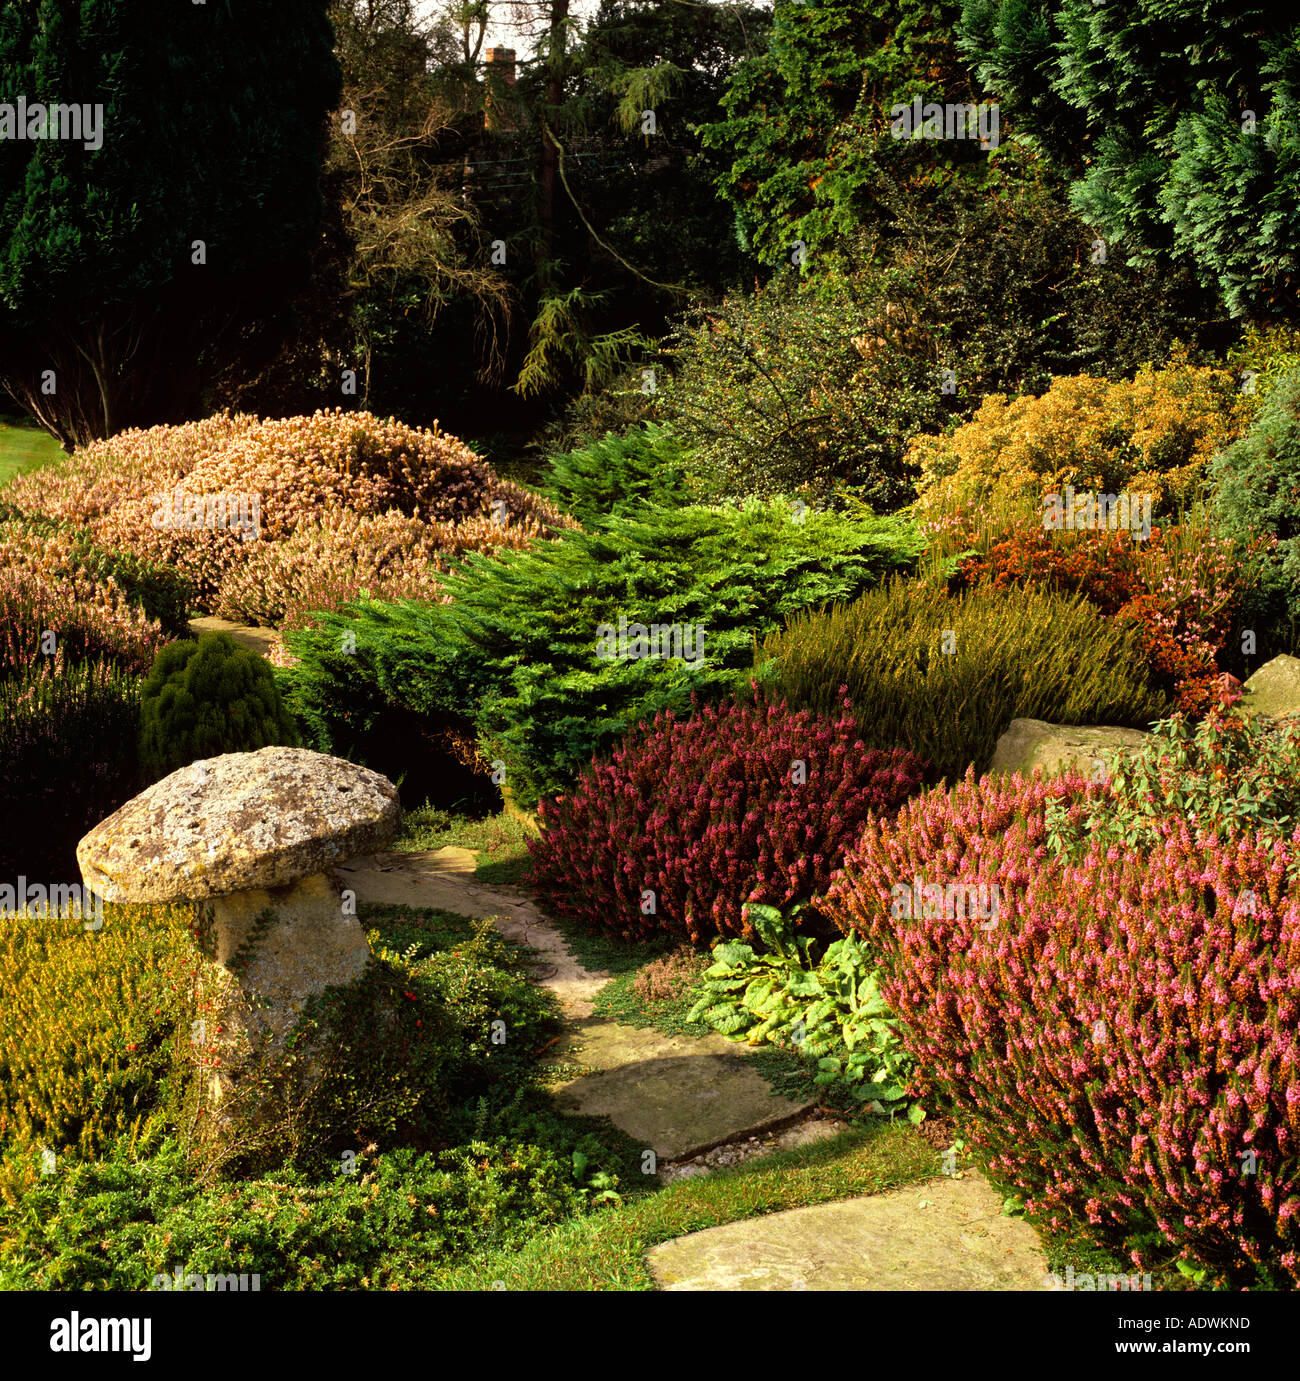 Garden Stockport England Gardening Stock Photos & Garden Stockport ...